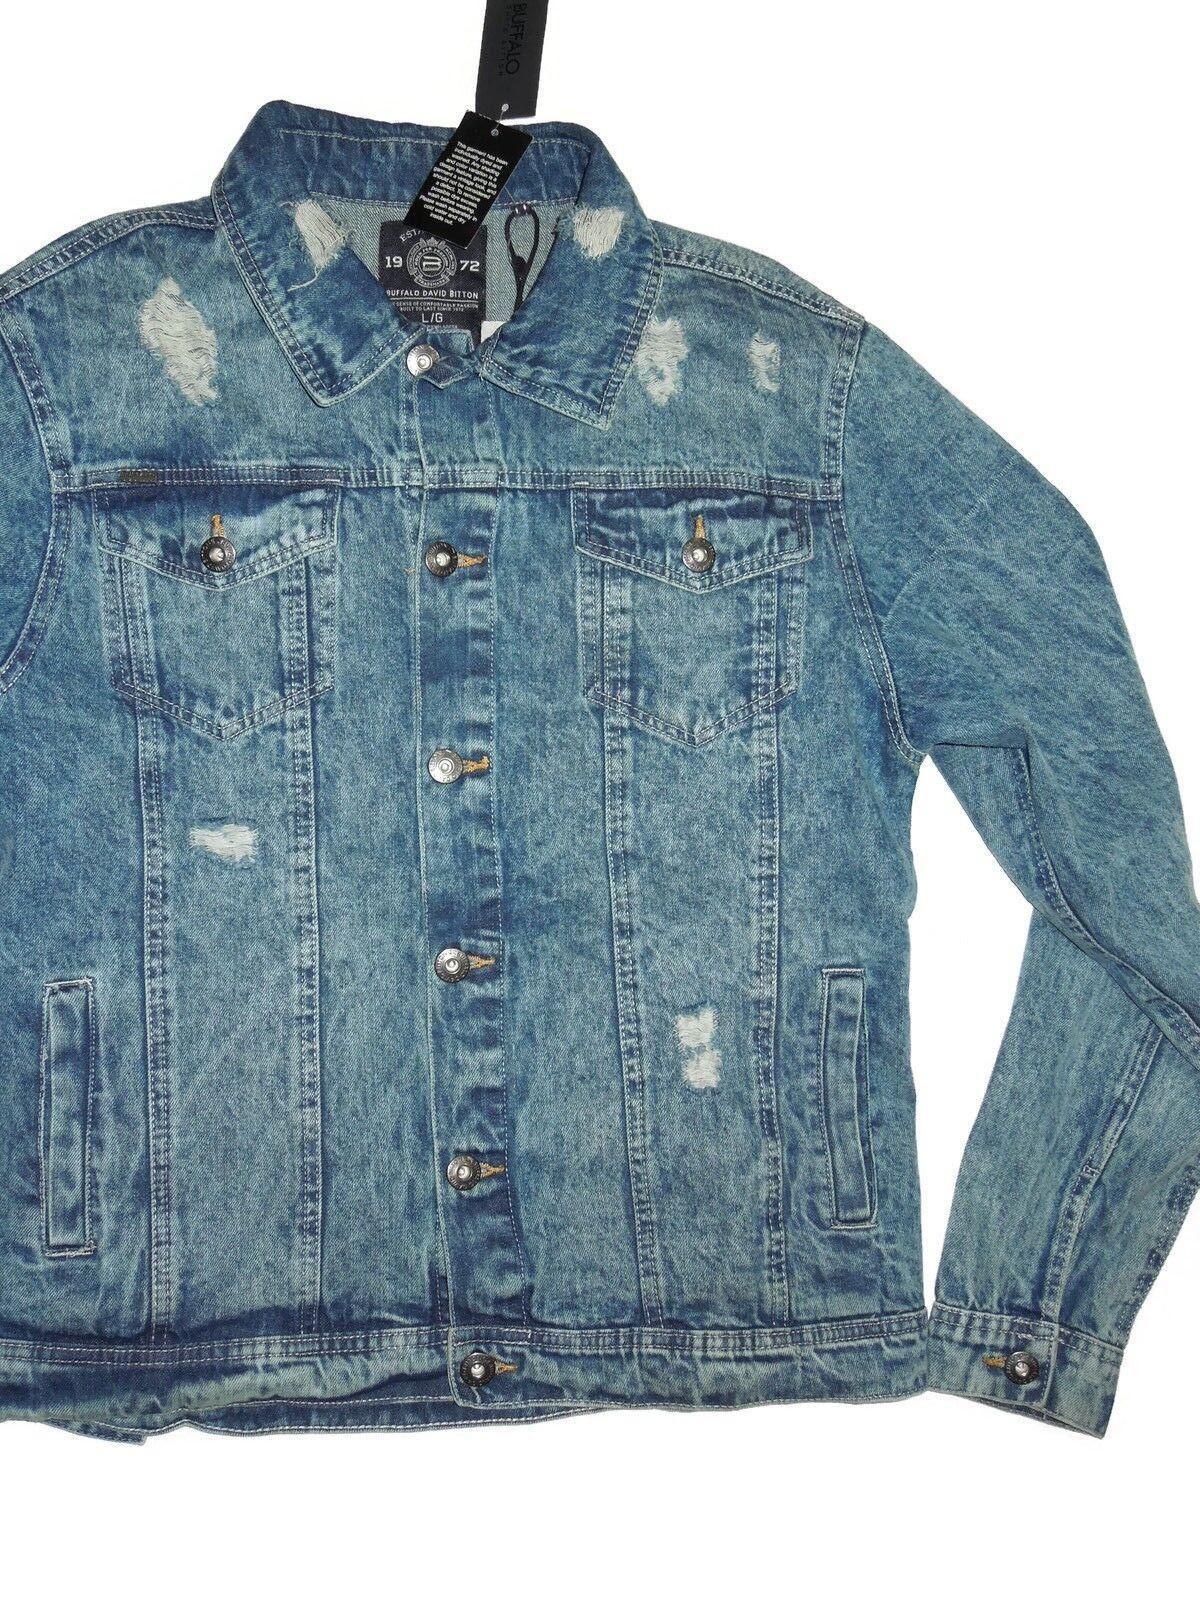 Buffalo David Bitton Mens Jean Jeans